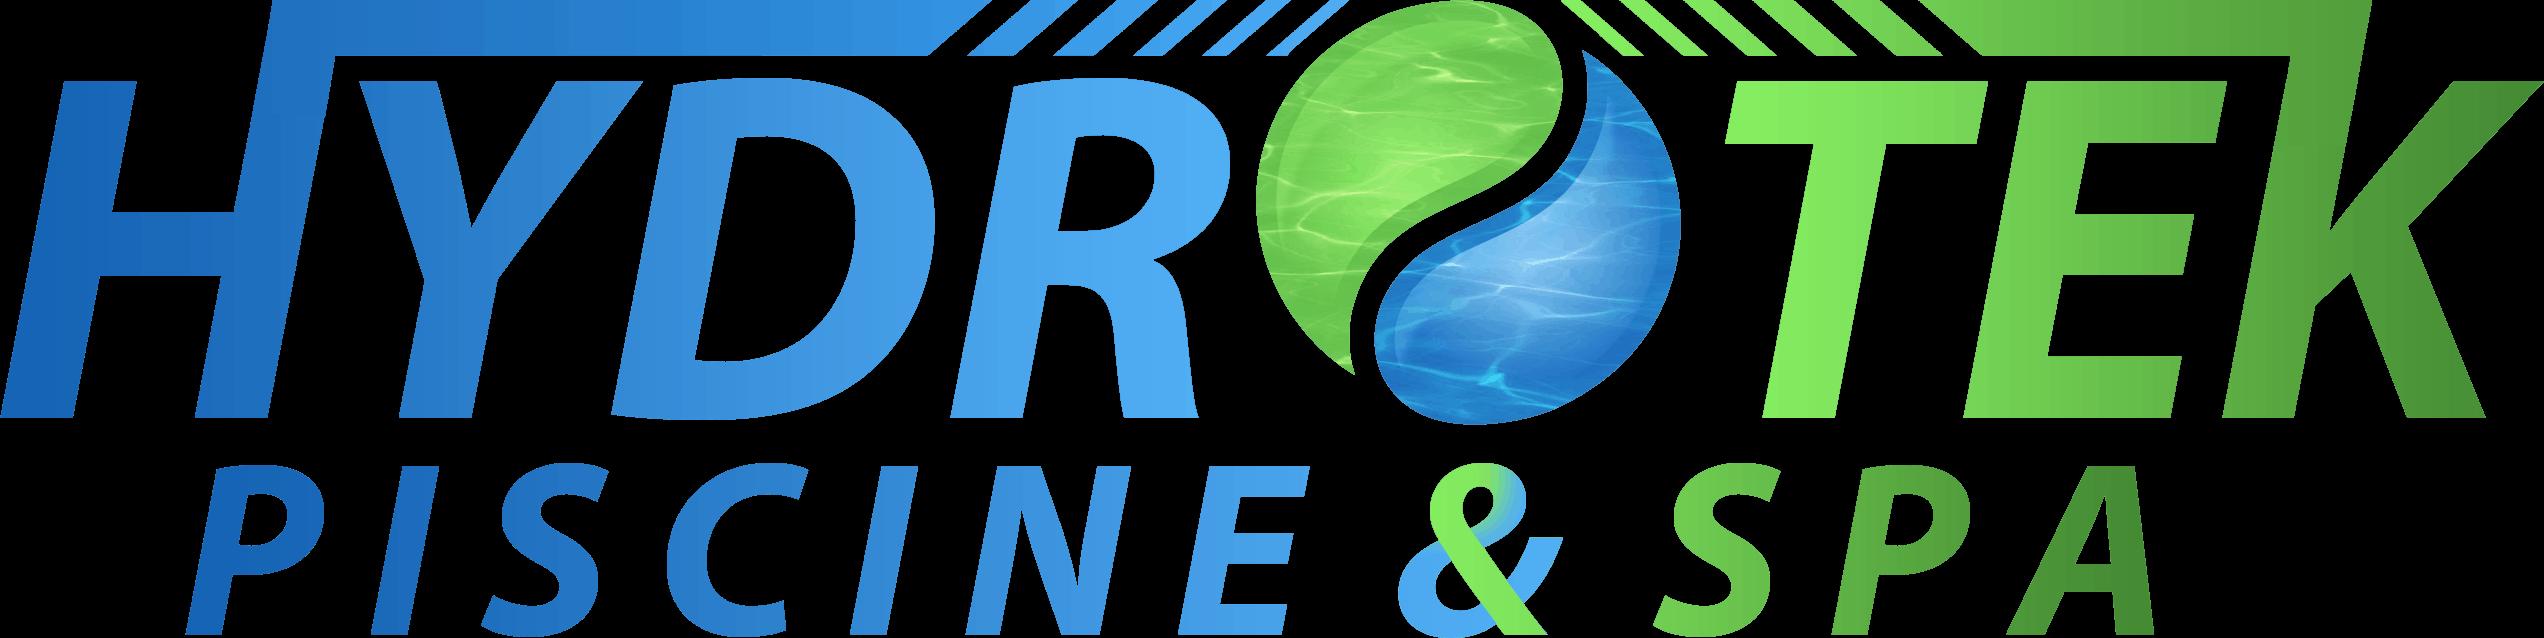 Piscines | Spas | Vente | Rénovation | Constructeur | Normandie | Caen | Calvados | Hydrotek